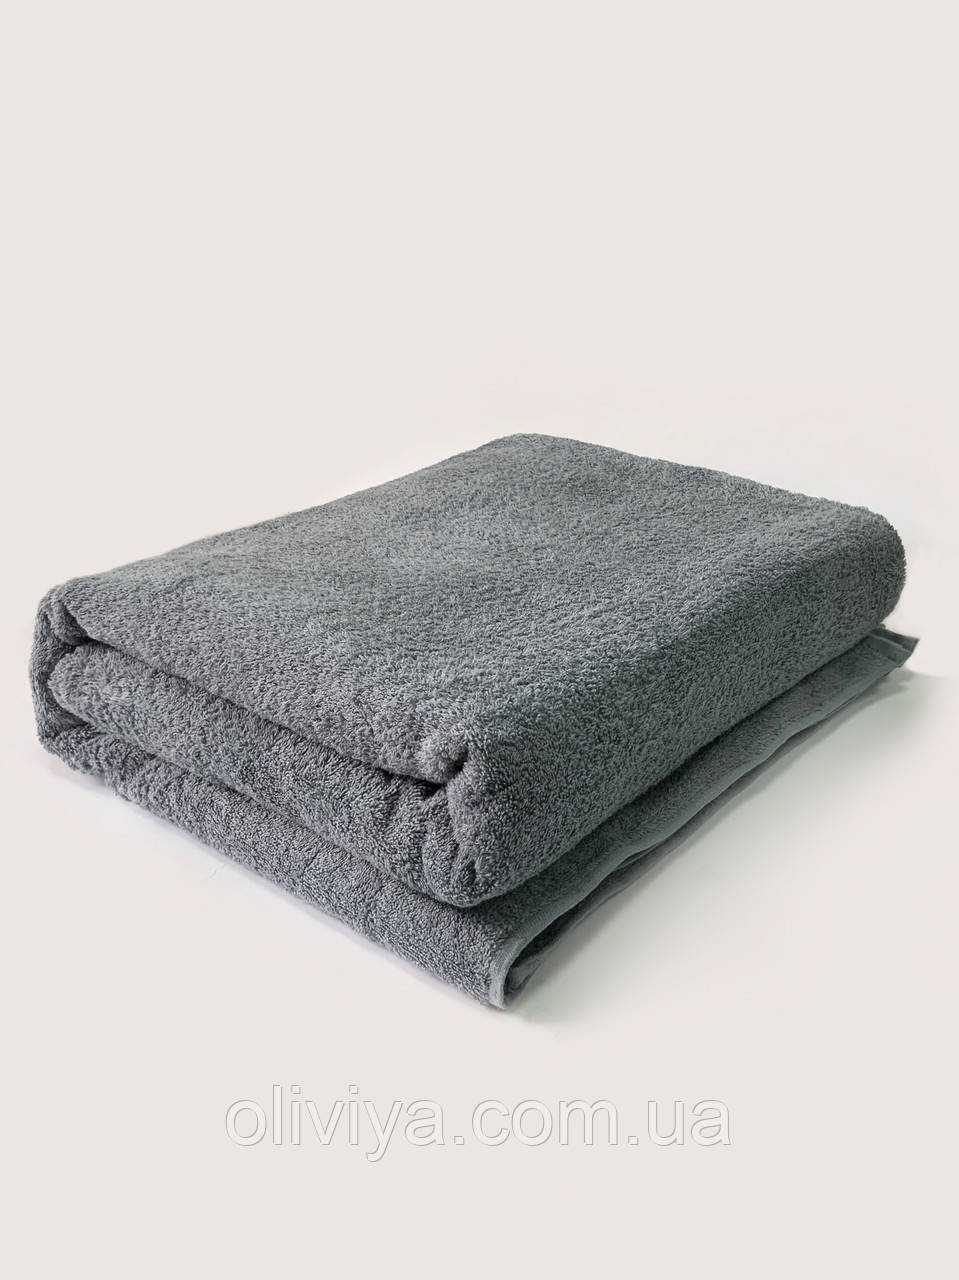 Полотенце для пляжа темно-серое